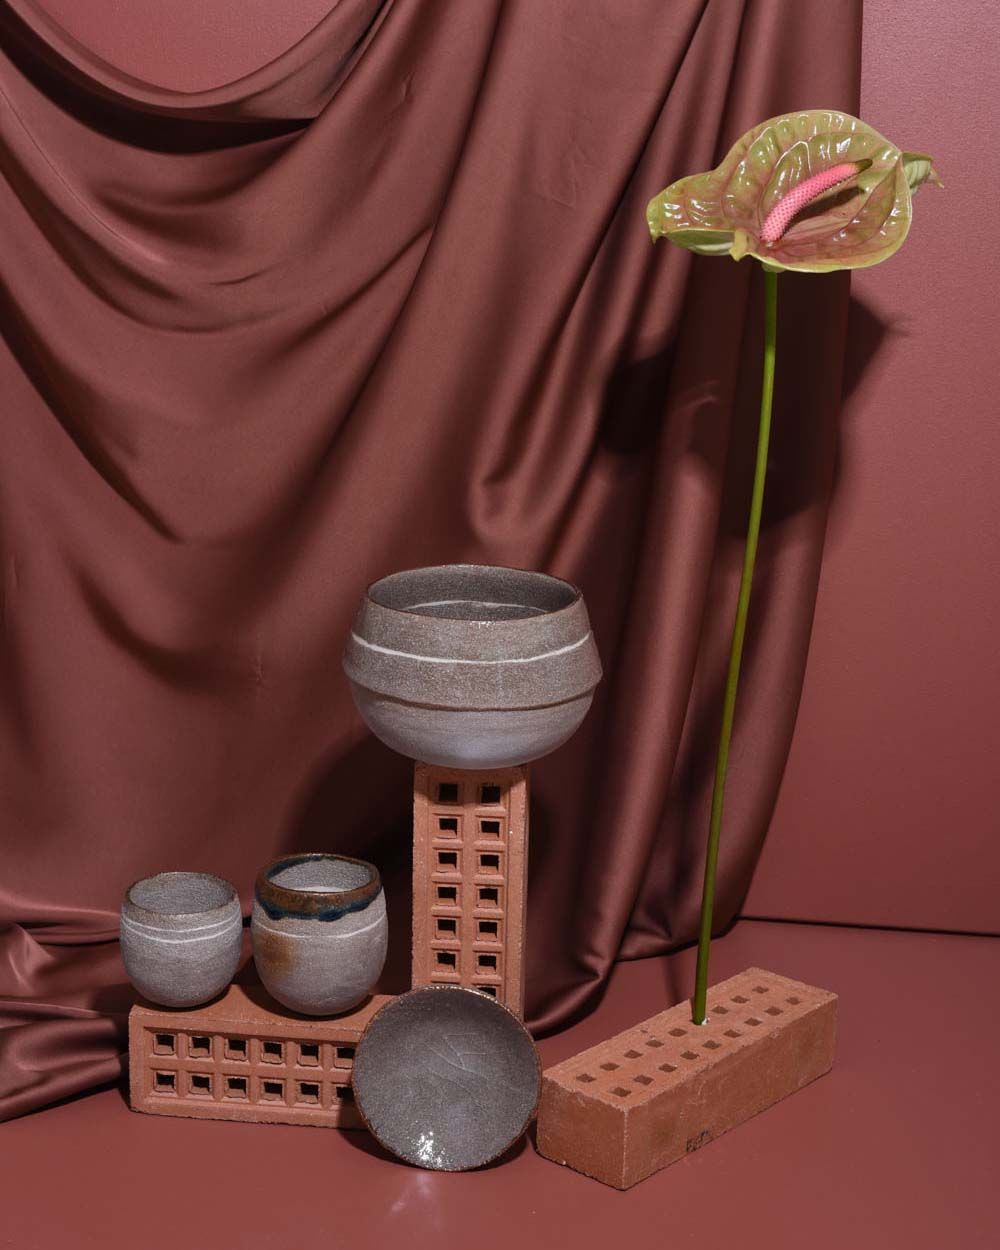 Styled image of Irene & Edith ceramics on terracotta bricks